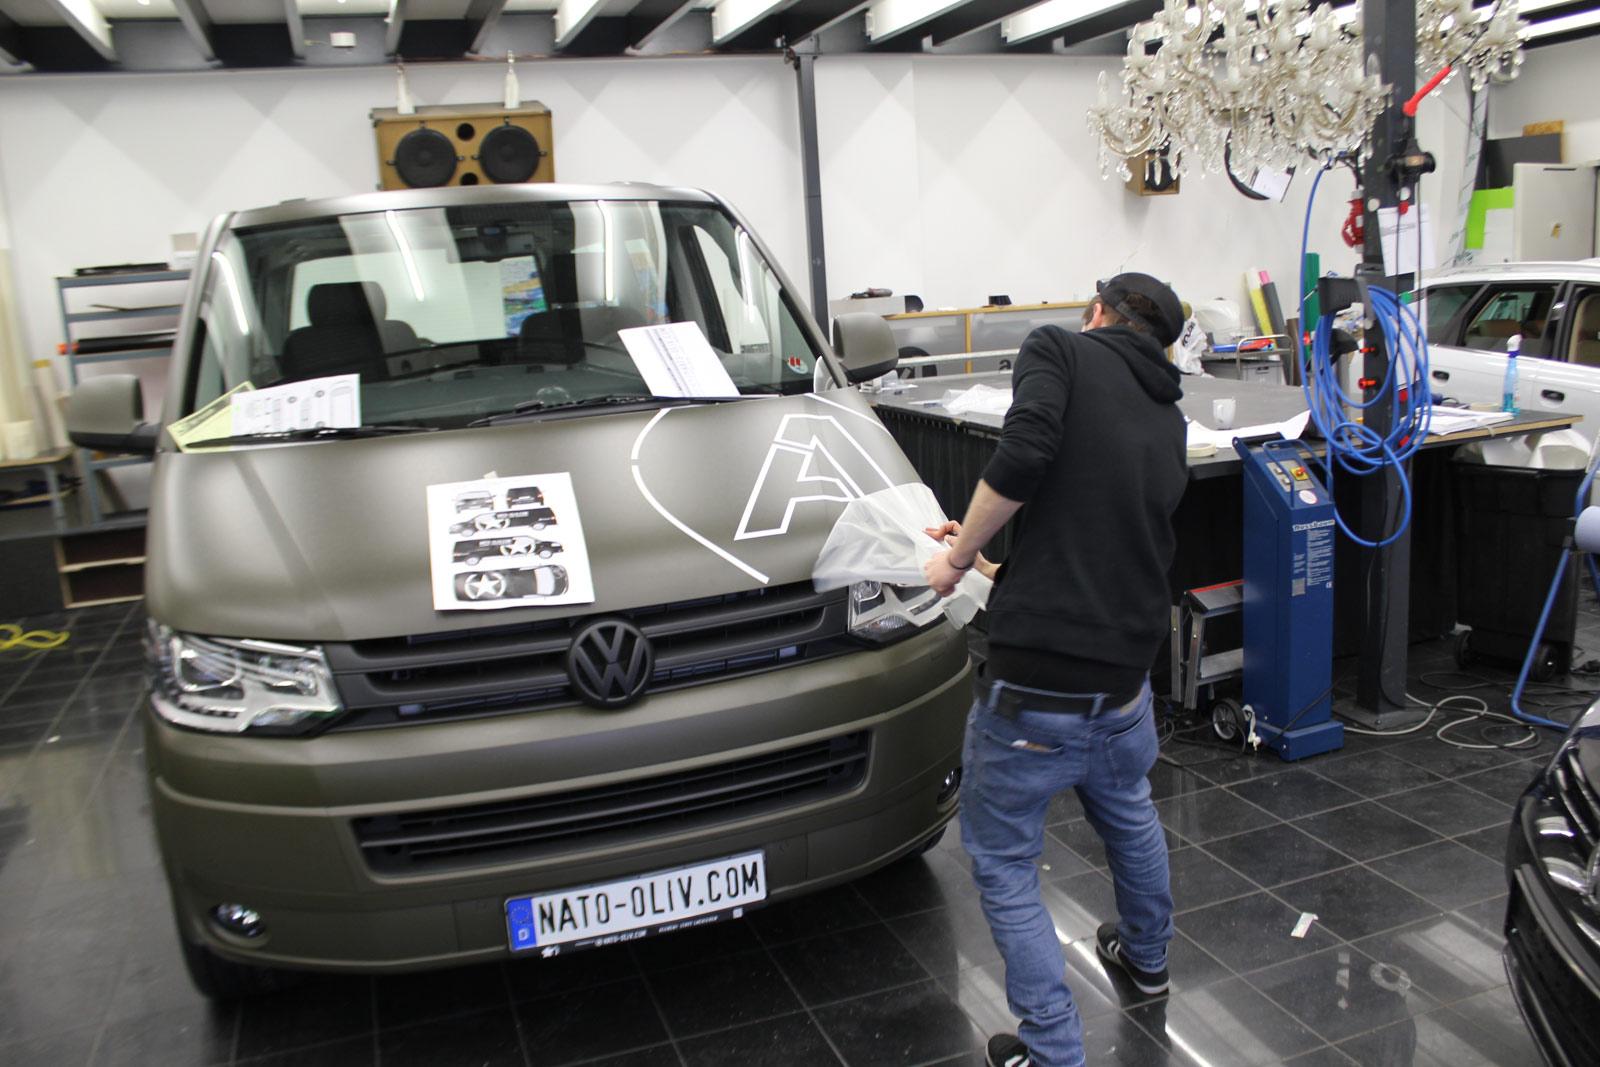 VW_T5_VOLLFOLIERUNG_NATO-OLIV_05